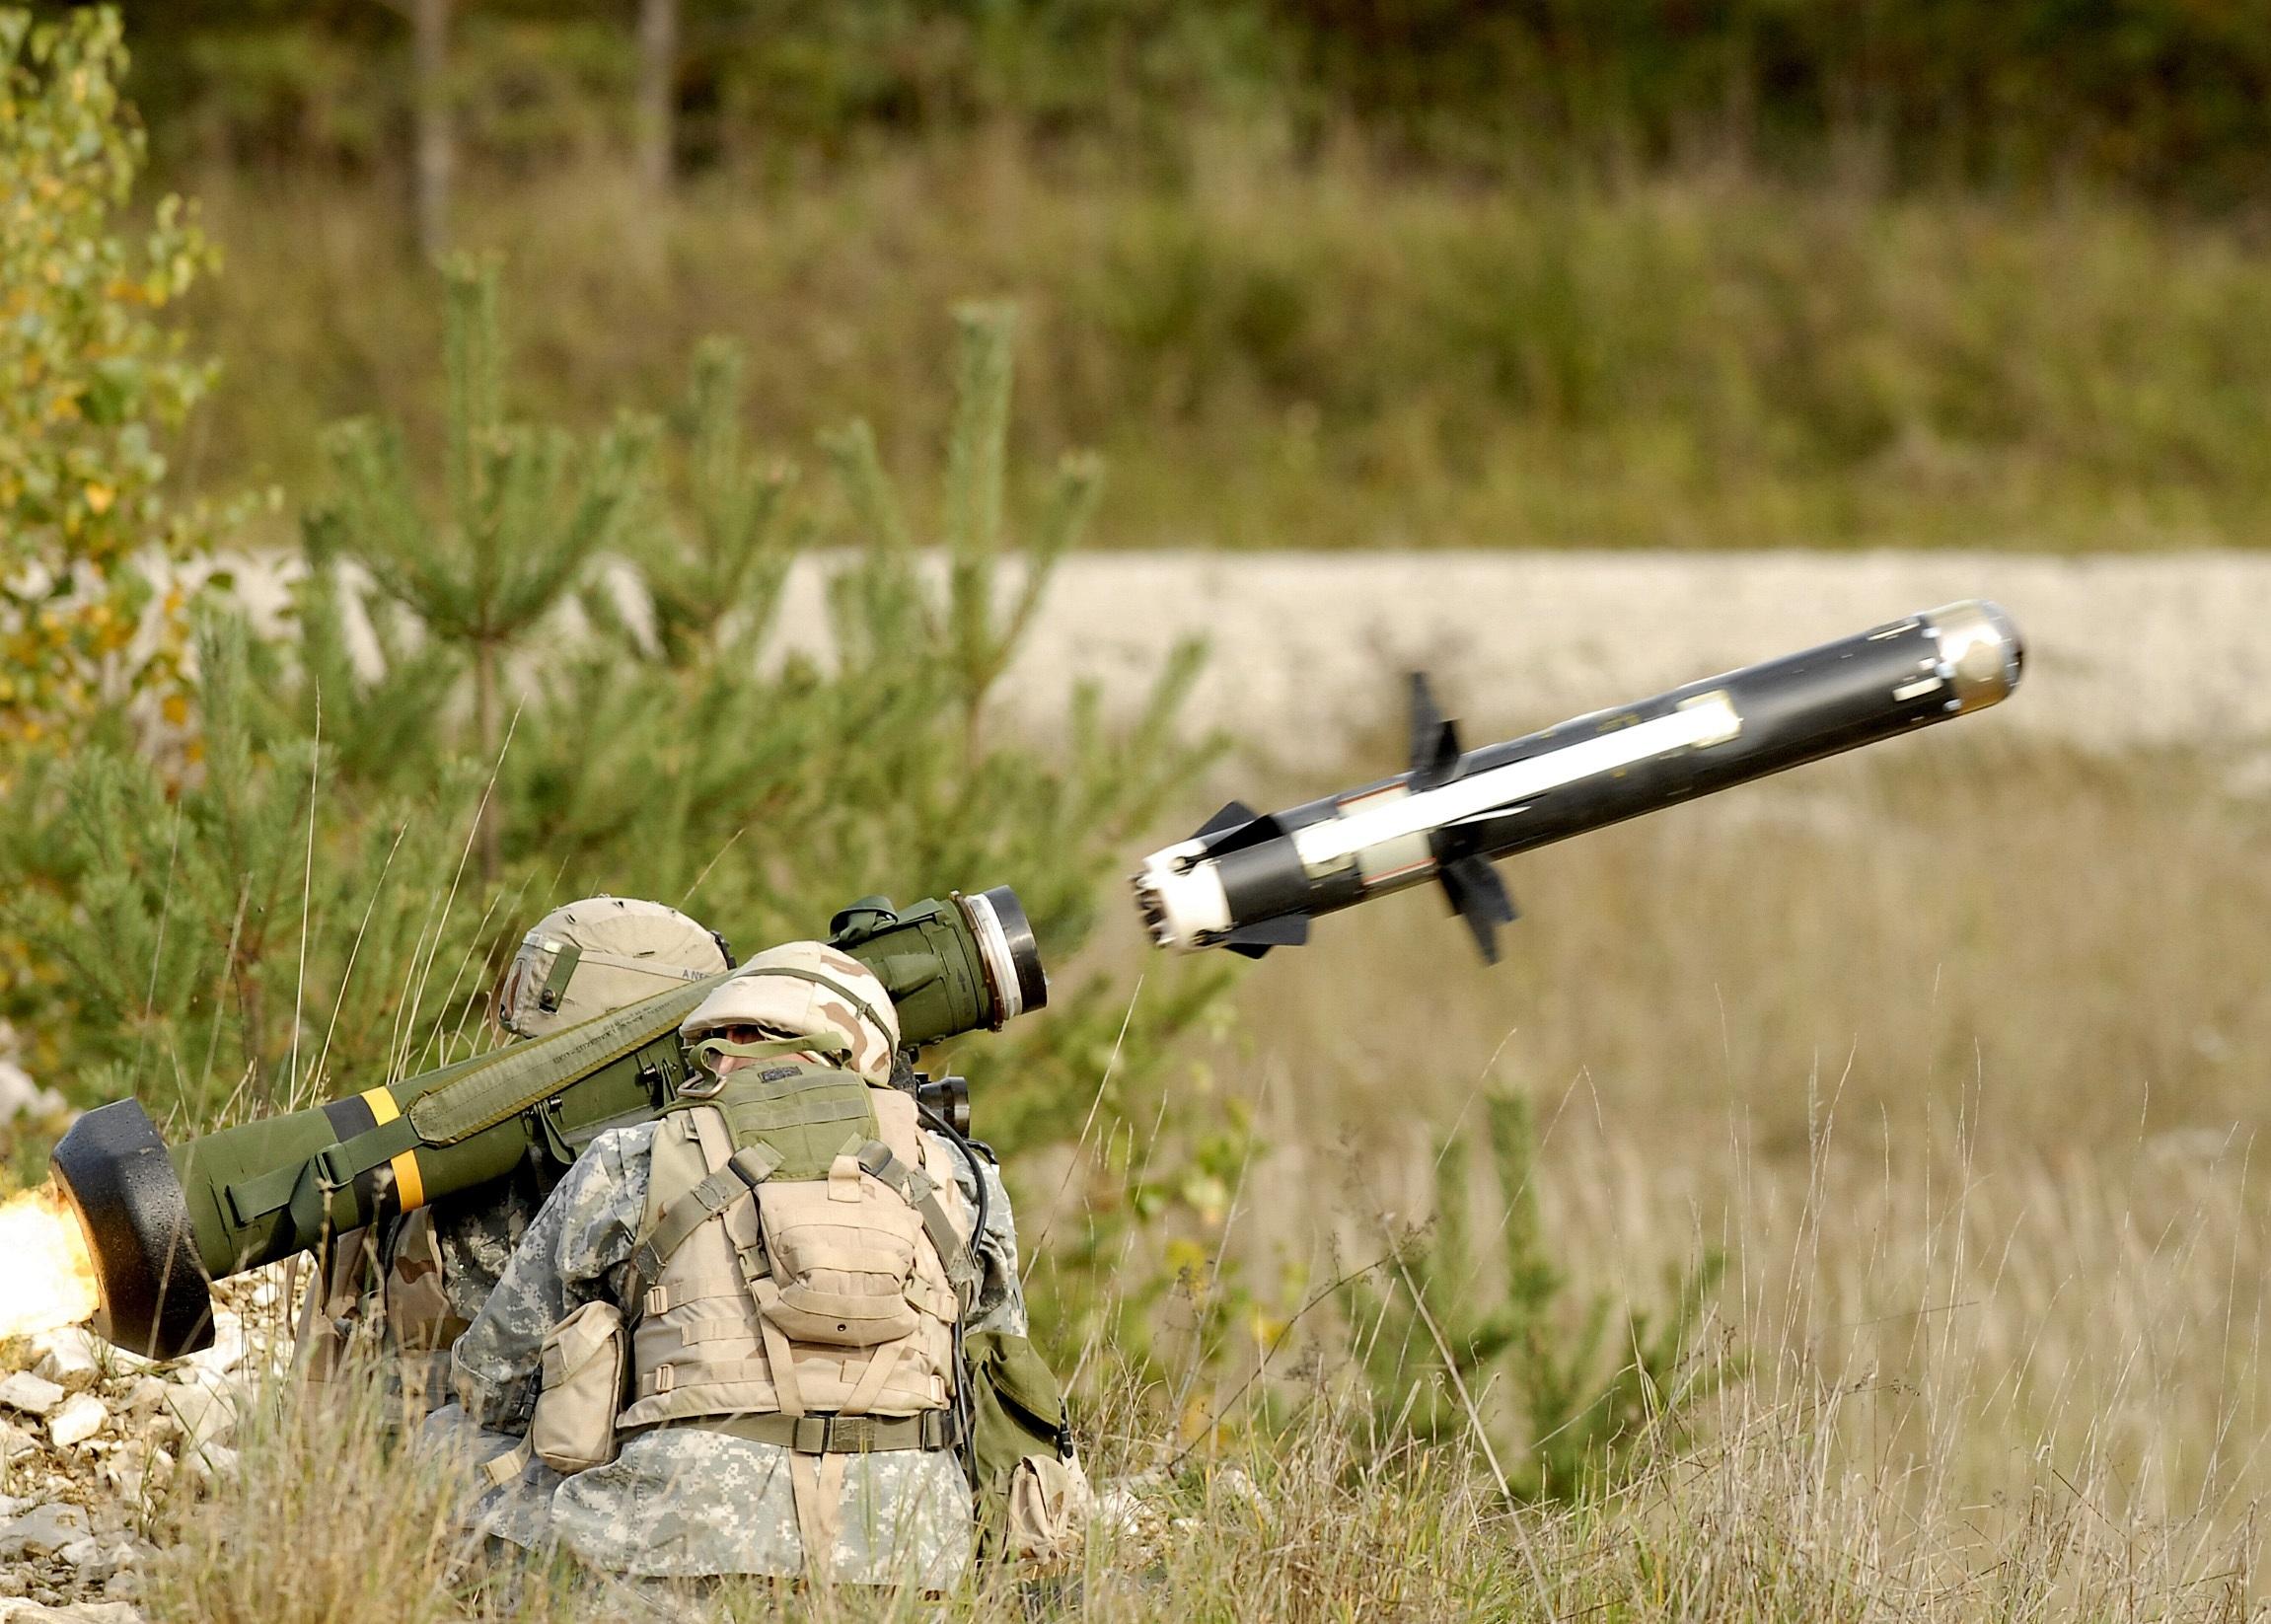 الاردن يشتري مكونات صواريخ Javelin     Army-fgm148